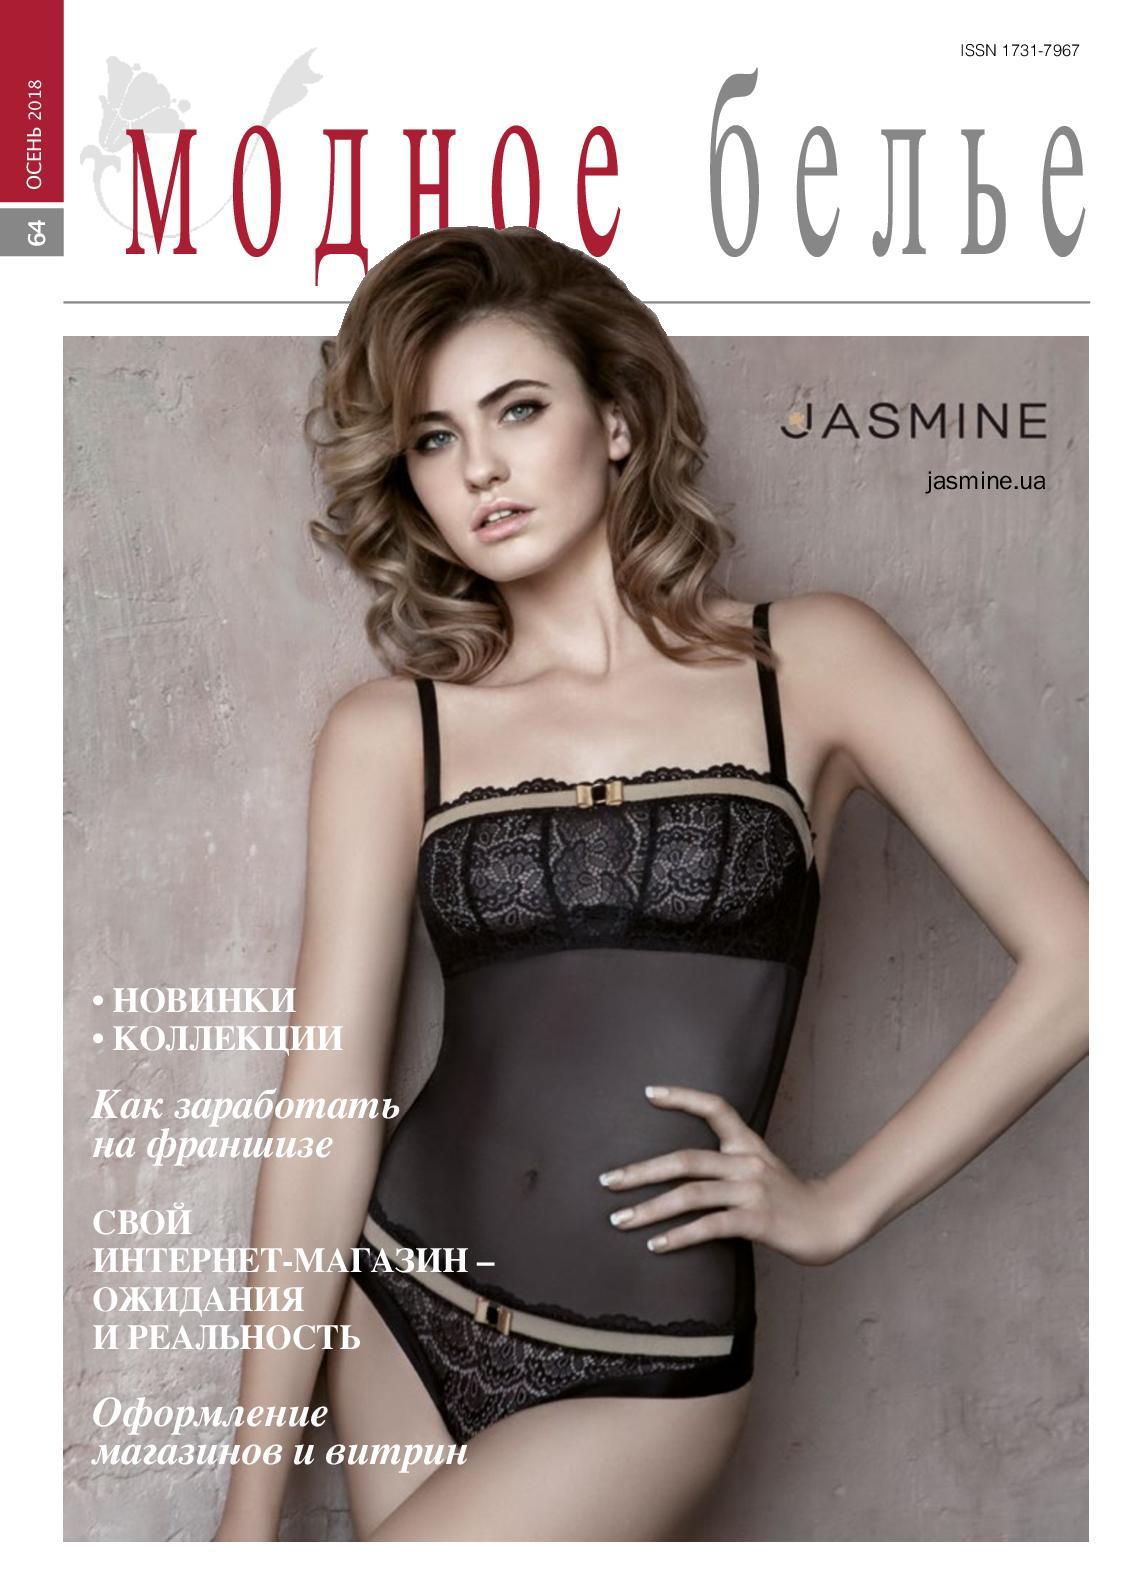 c4b09575f49e0 Calaméo - Журнал Модное Белье, осень 2018